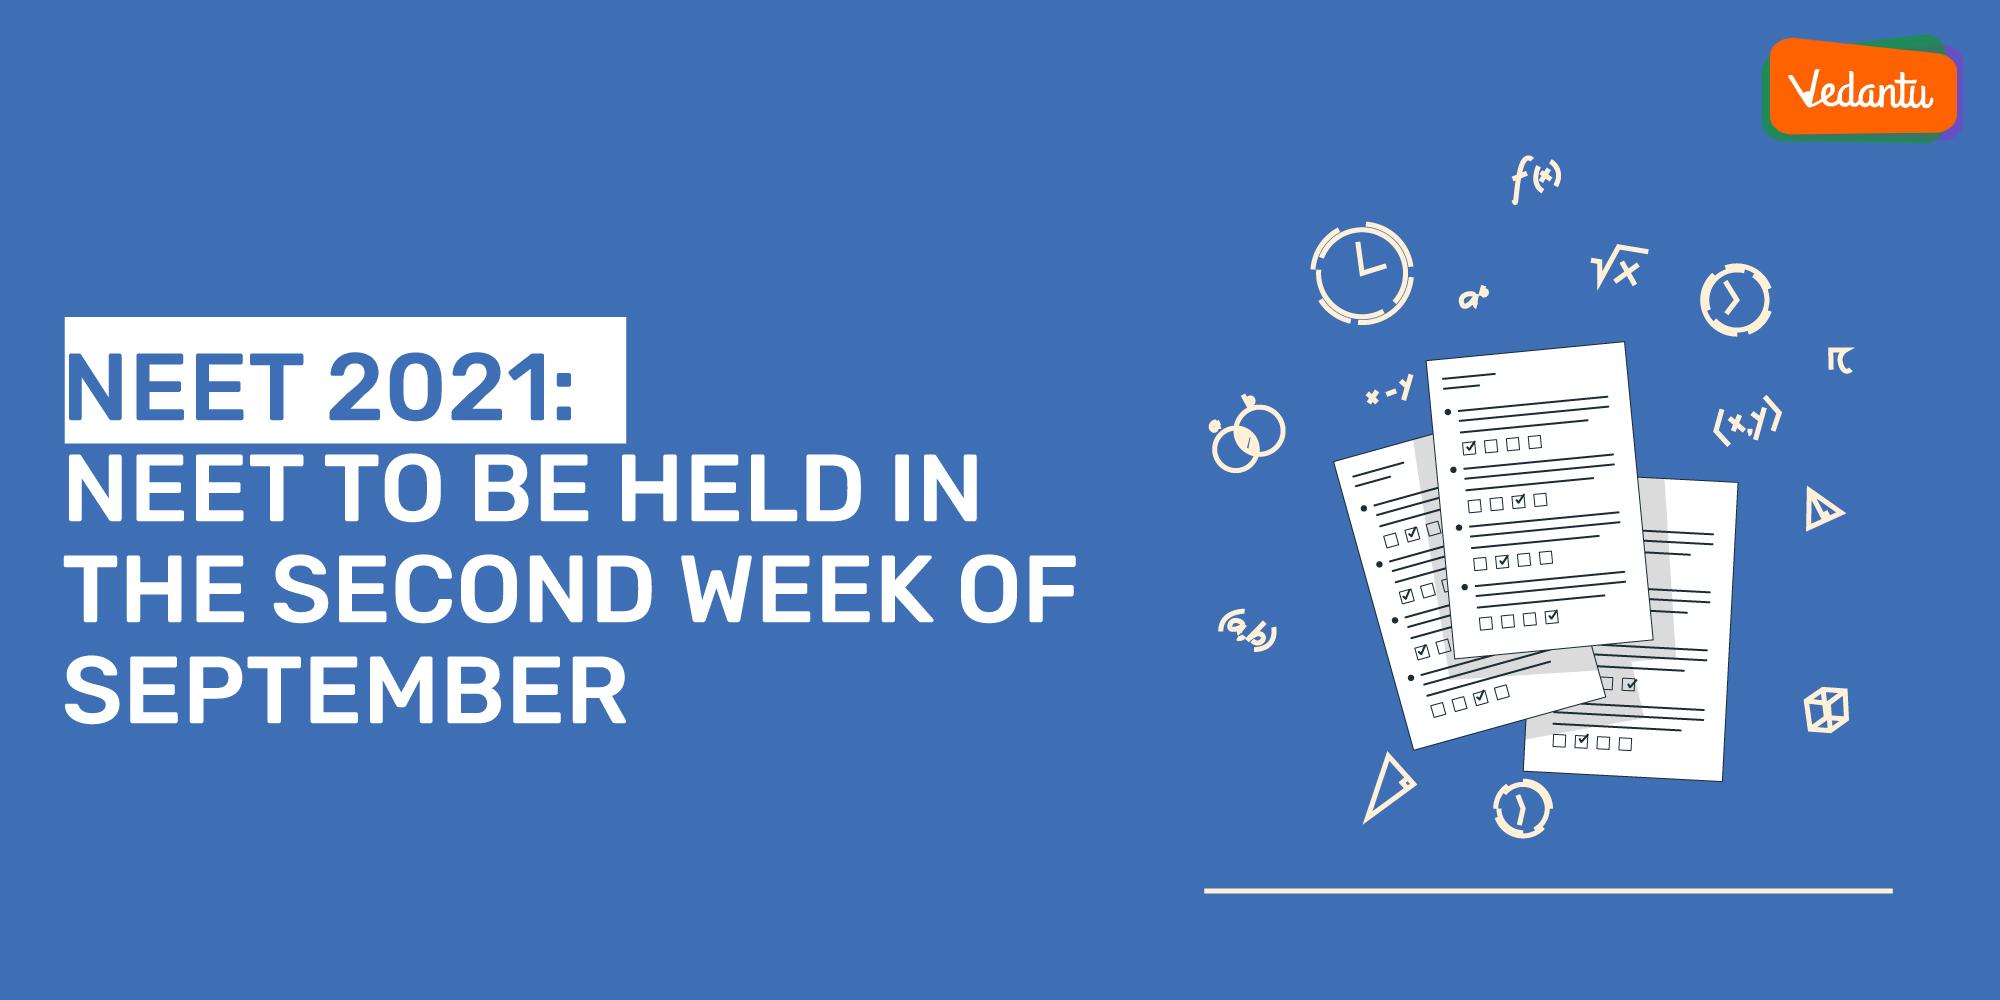 NEET 2021: NEET to be Held in the Second Week of September